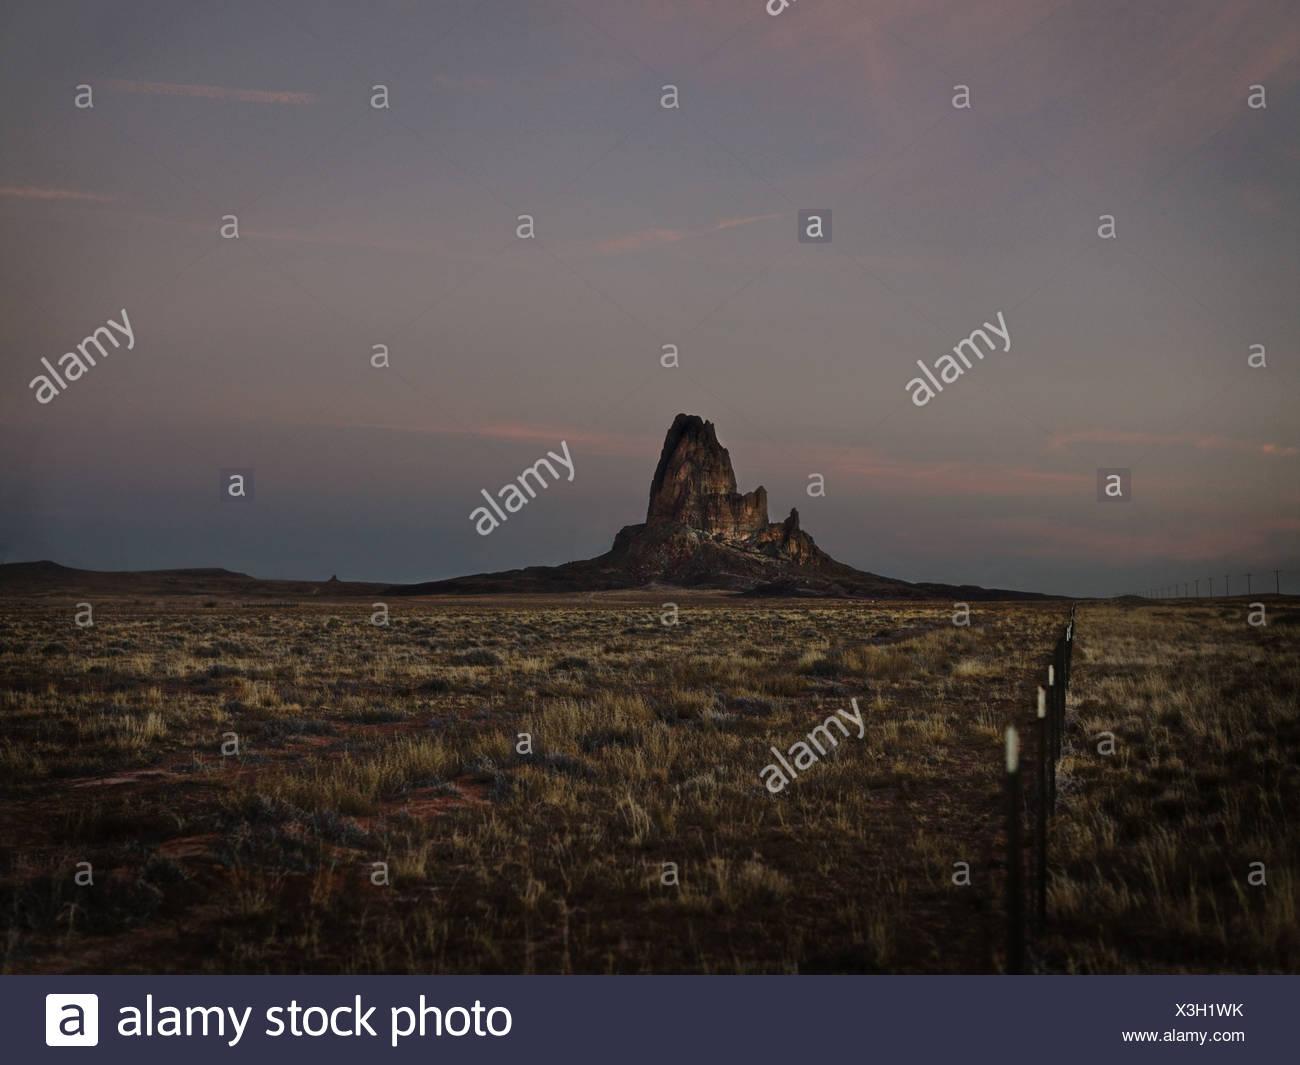 Rock formation in grassy desert Photo Stock